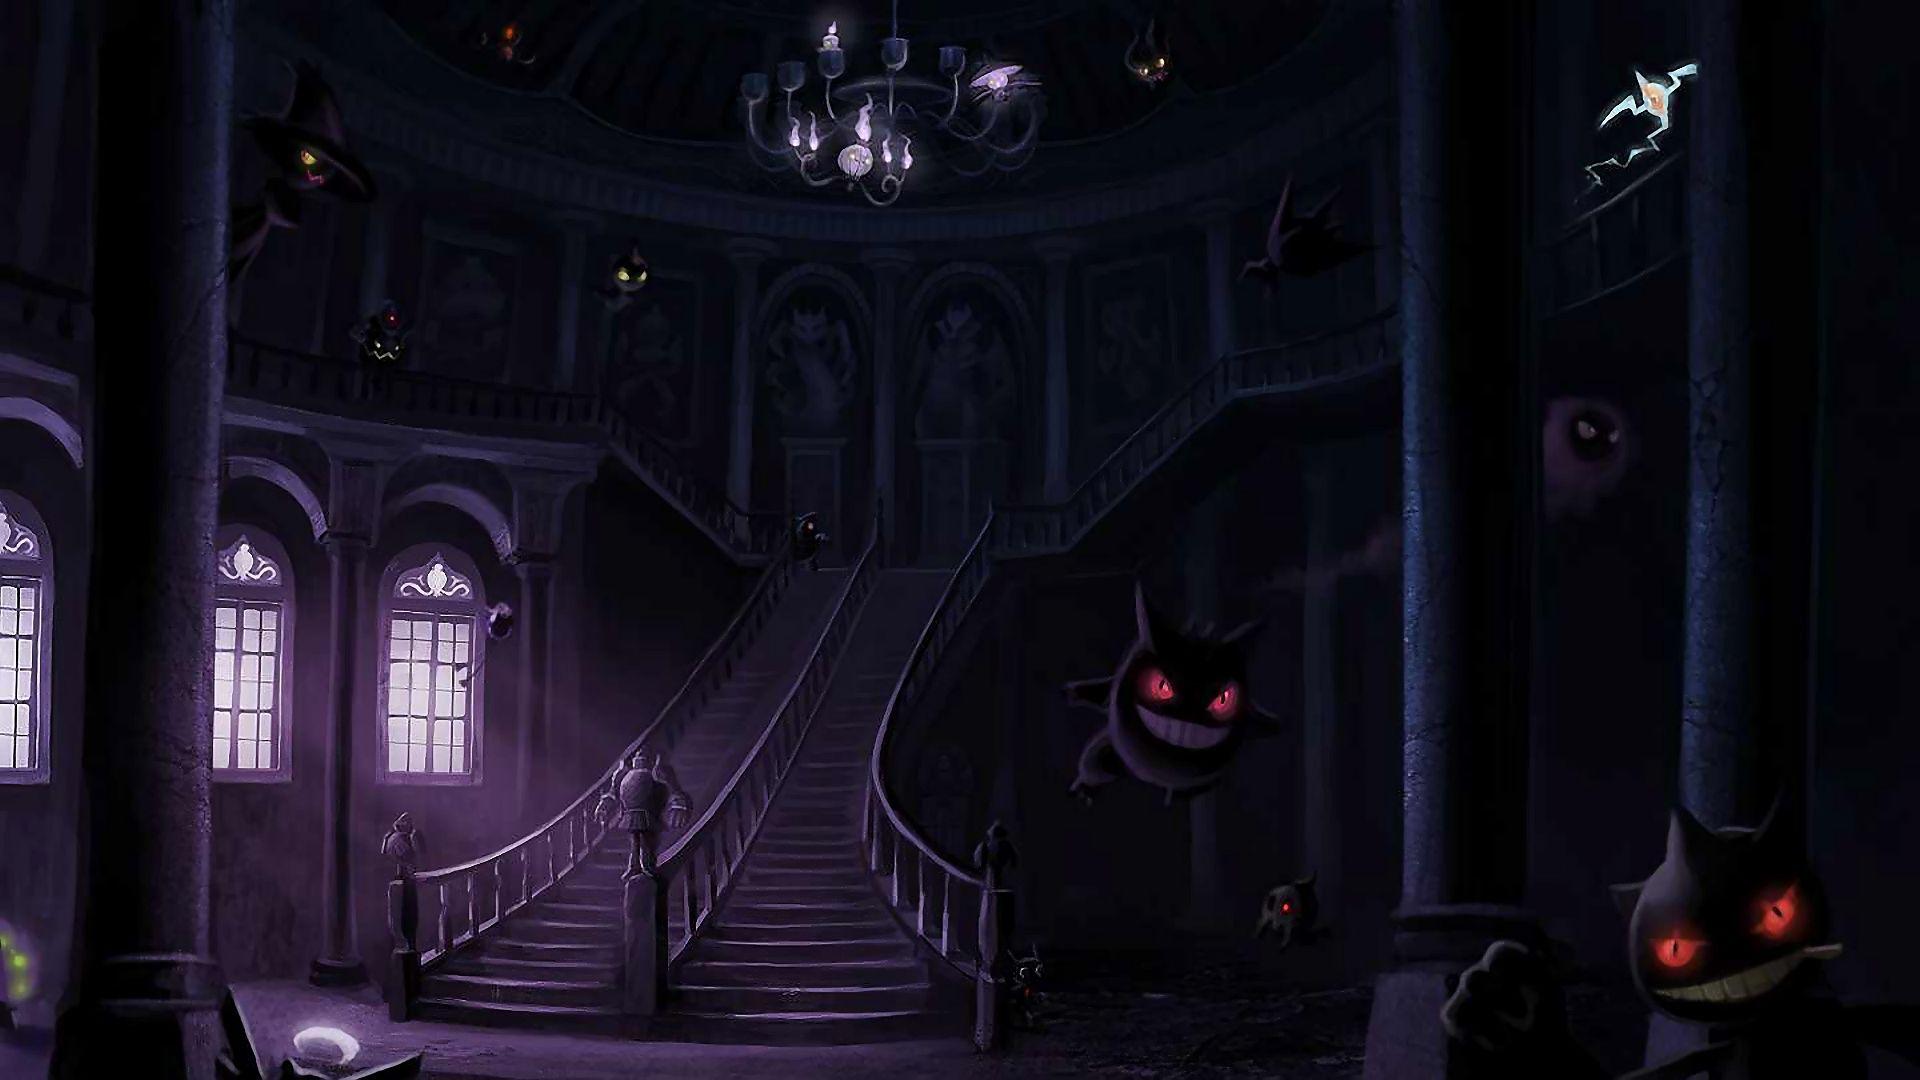 Ghost Pokemon wallpaper 14378 1920x1080